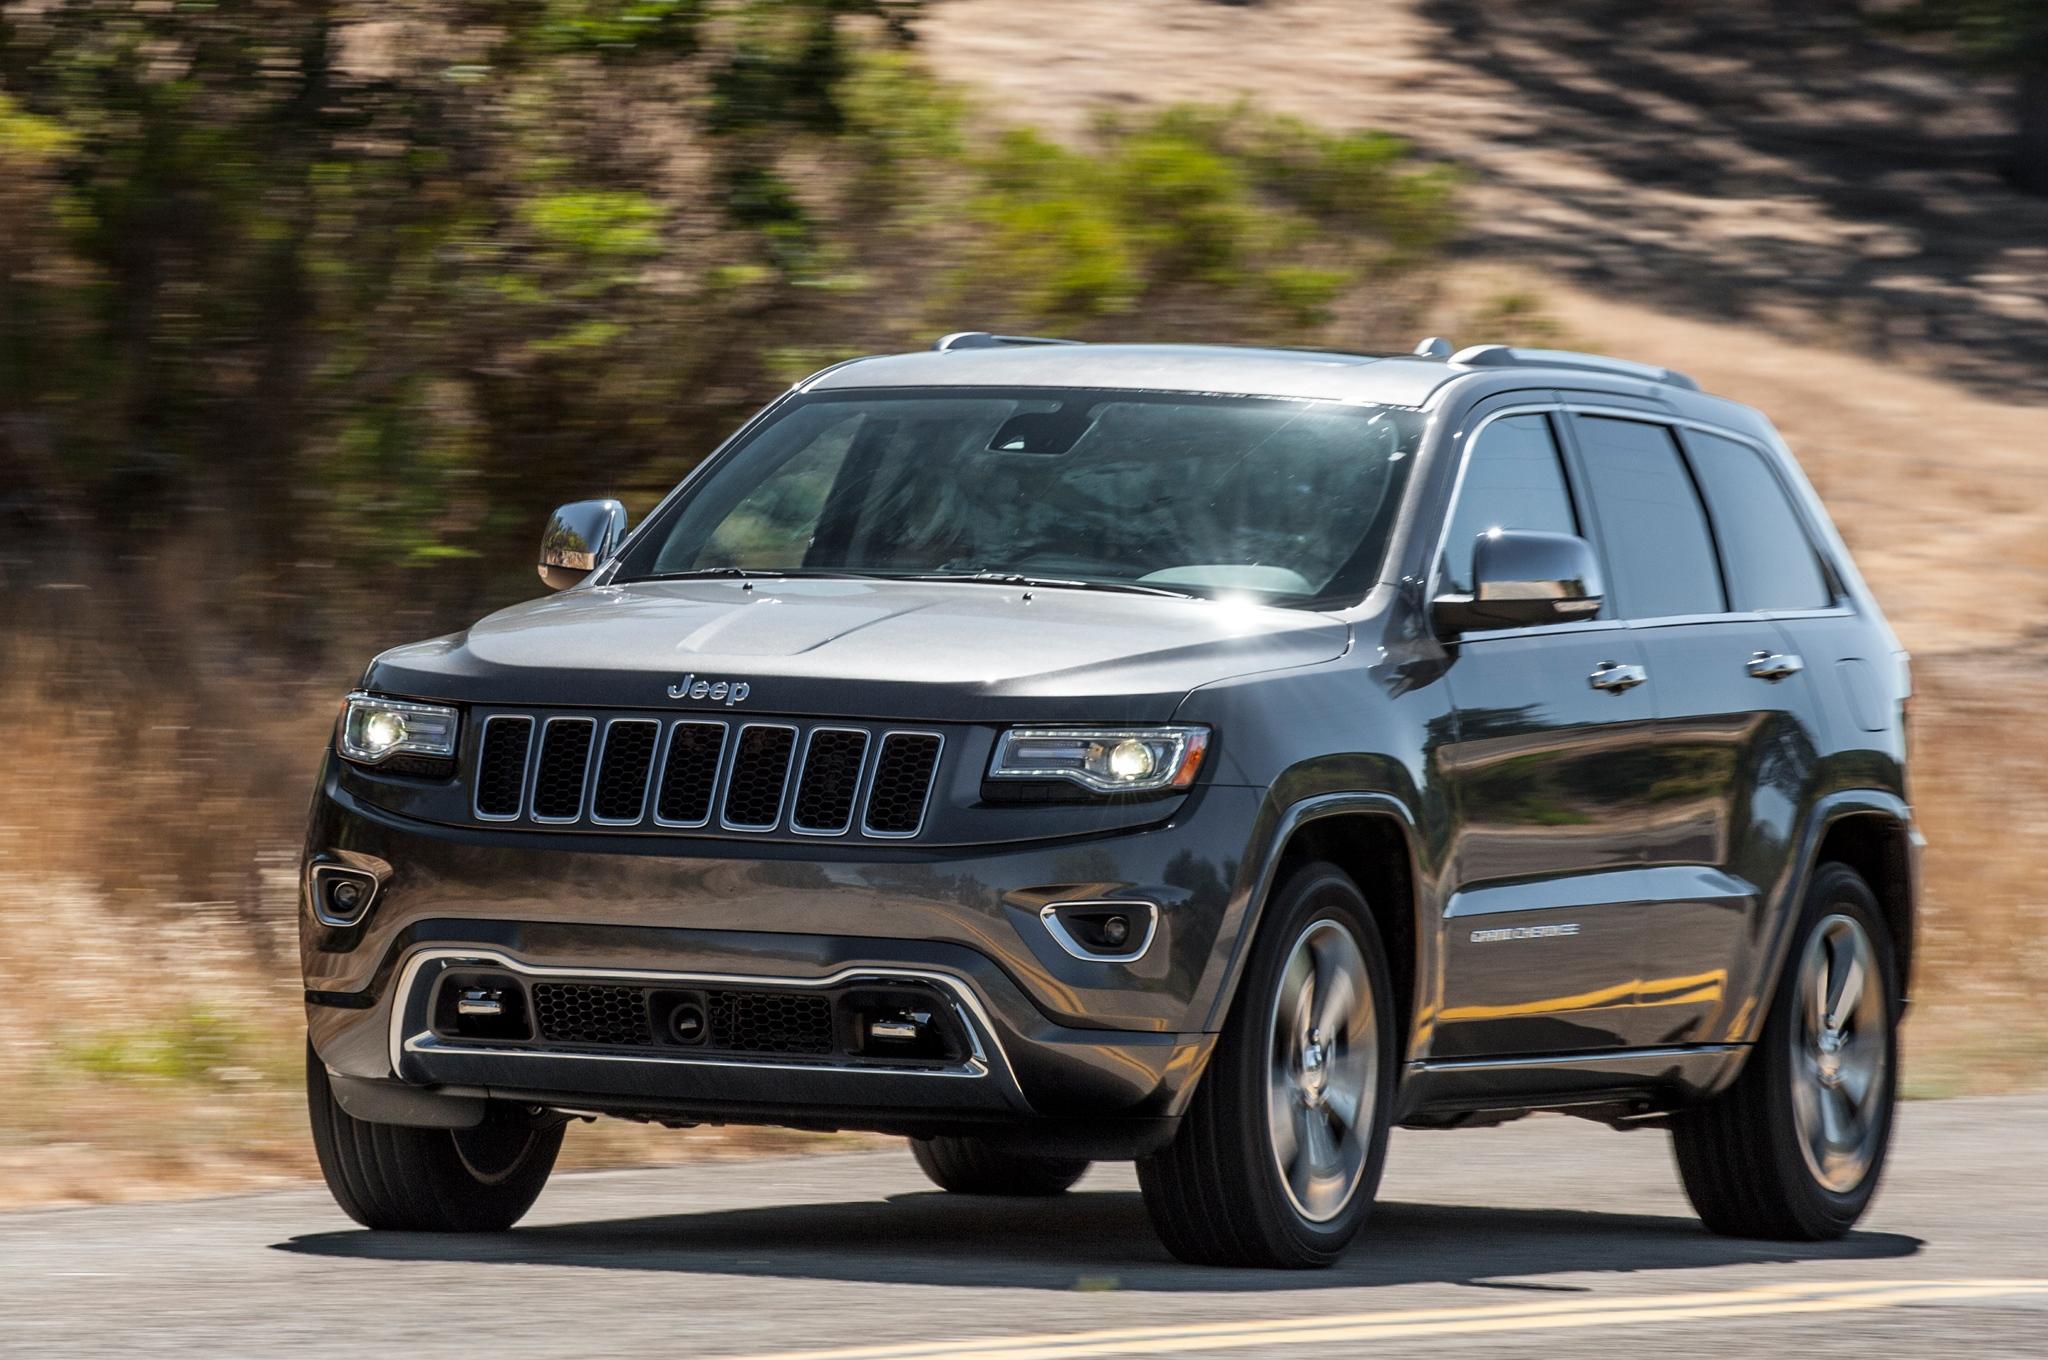 2015-Jeep-Grand-Cherokee-Altitude-Black-Wallpaper